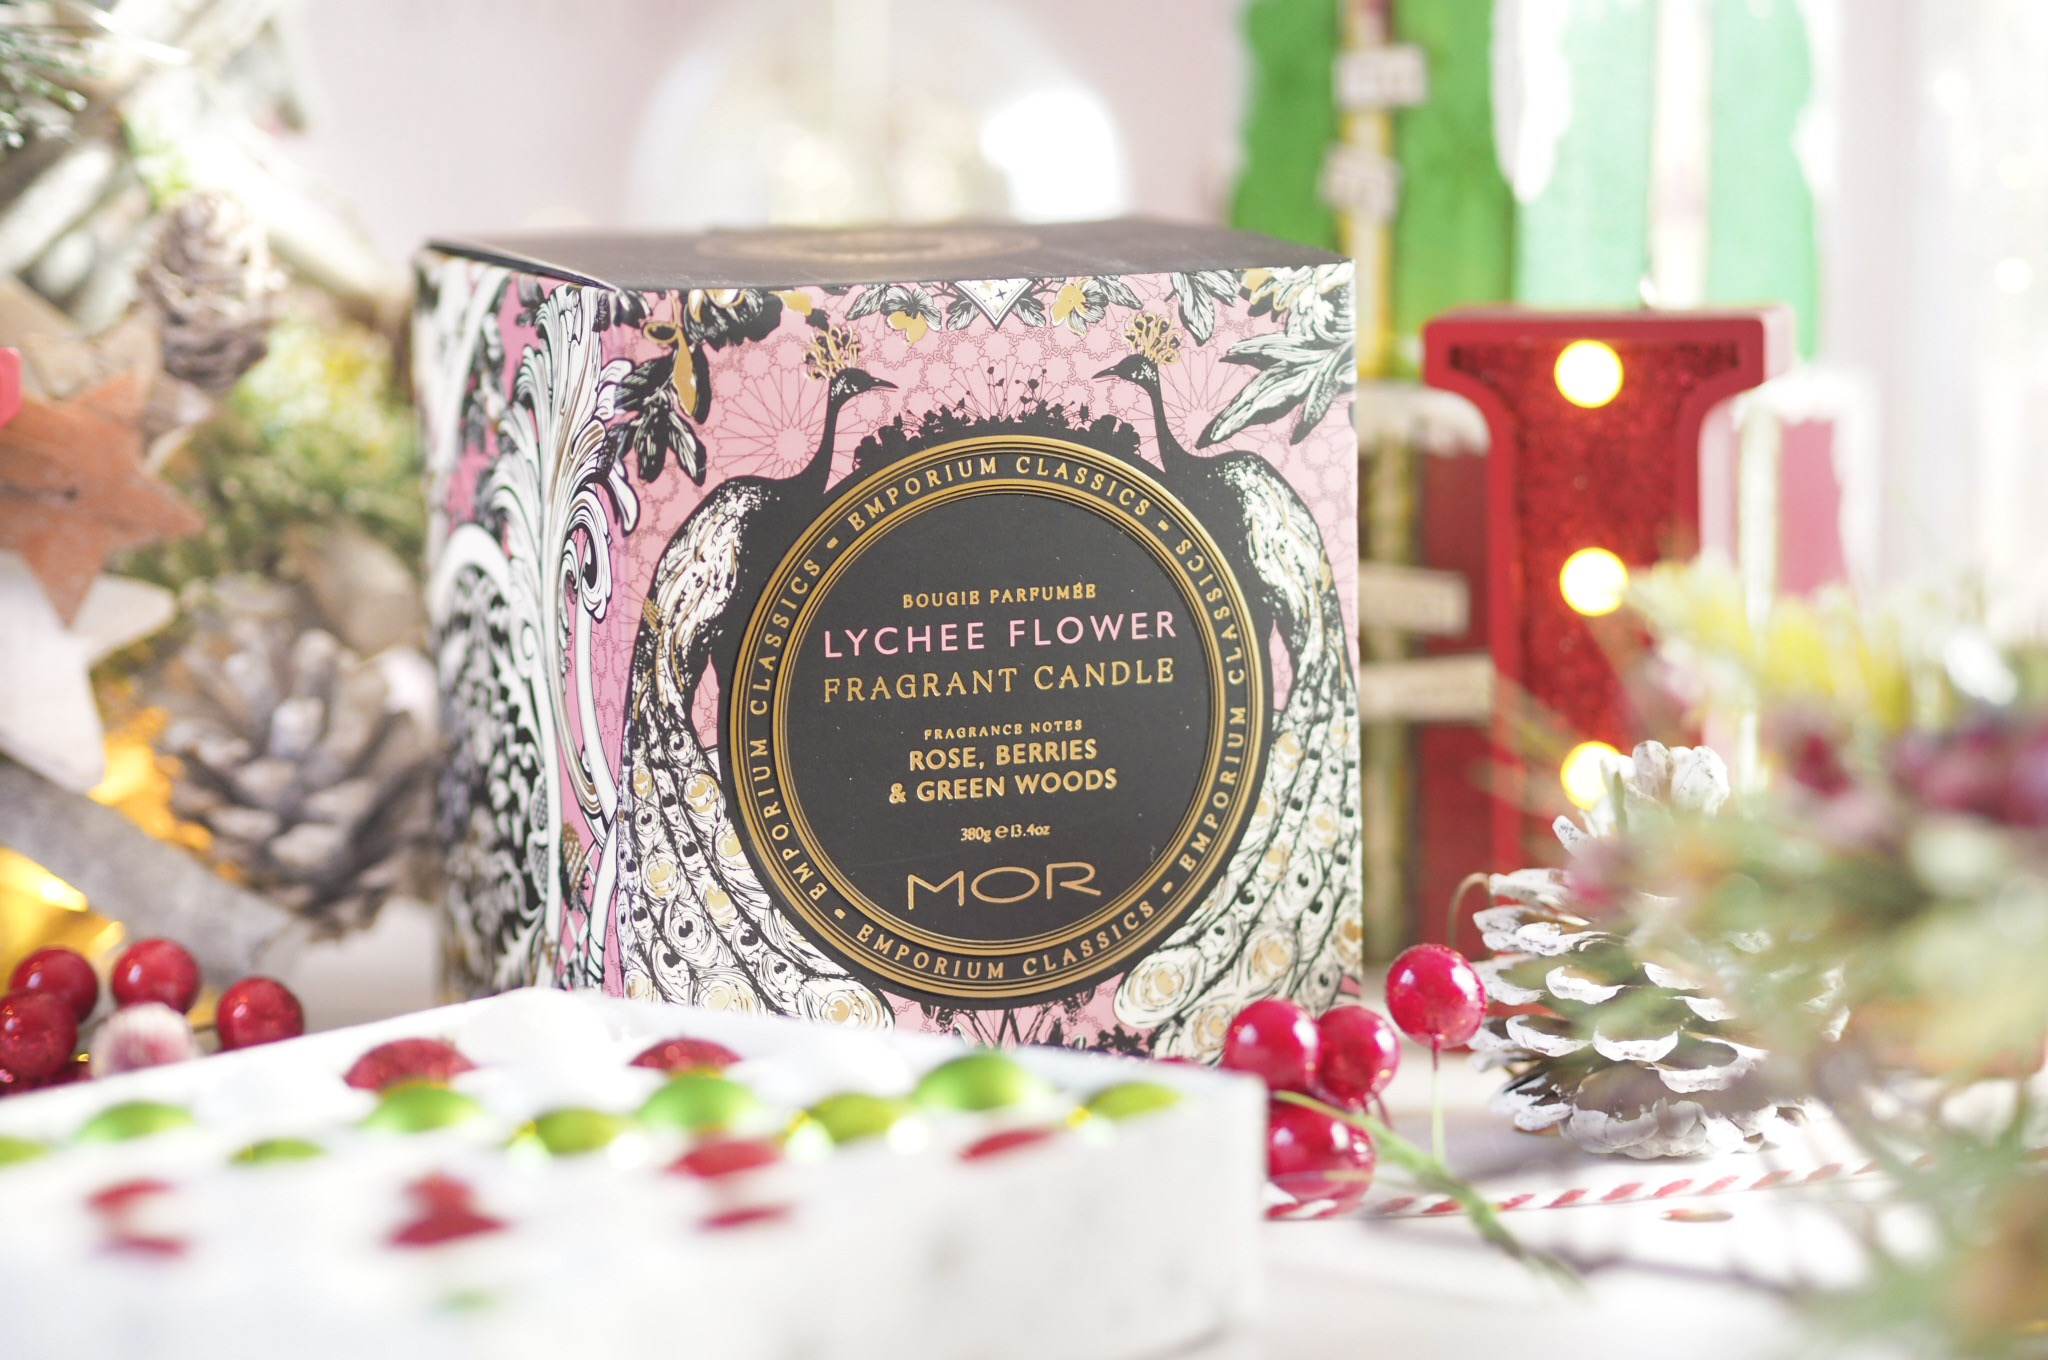 MOR Emporium Classics Lychee Flower Candle